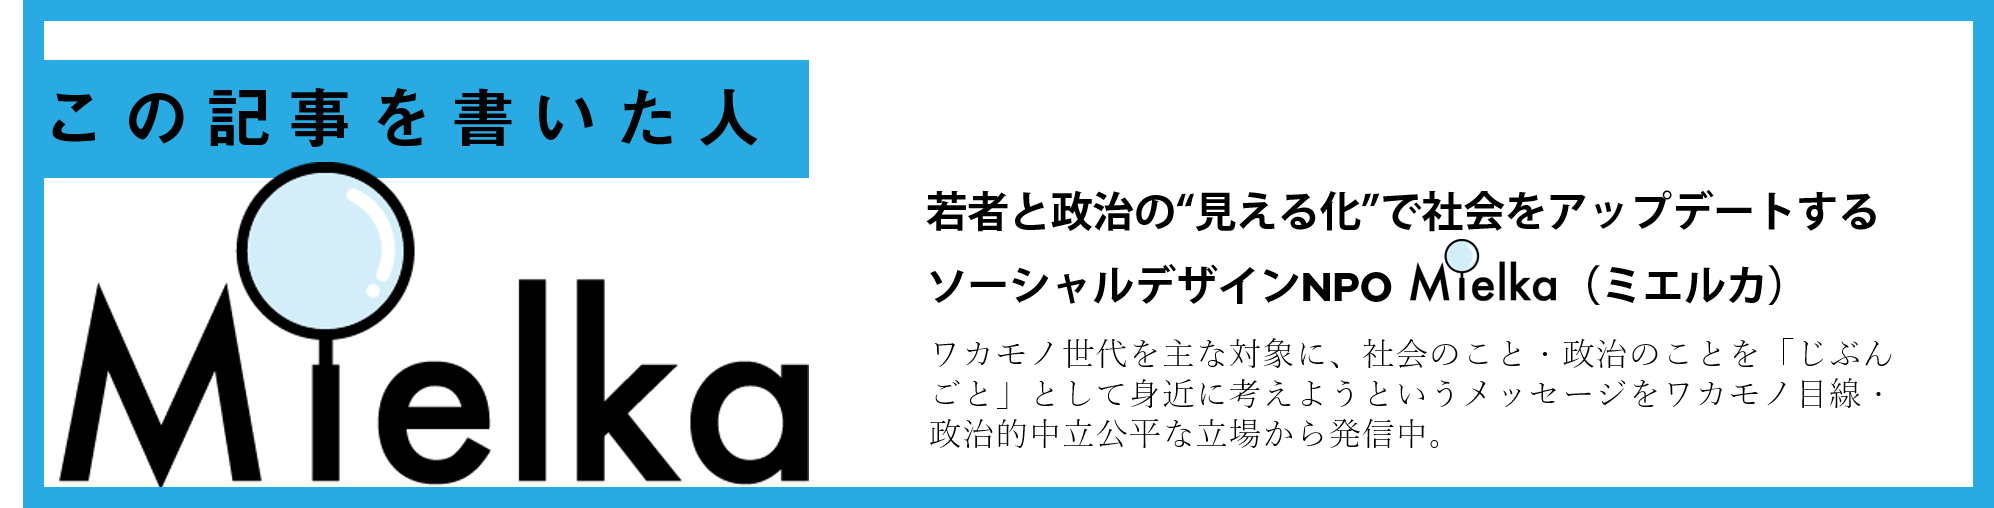 c8856789ec11ab8b1013037cef6929f9 - 【統治機構】公約比較-15の争点- 2017衆議院議員総選挙